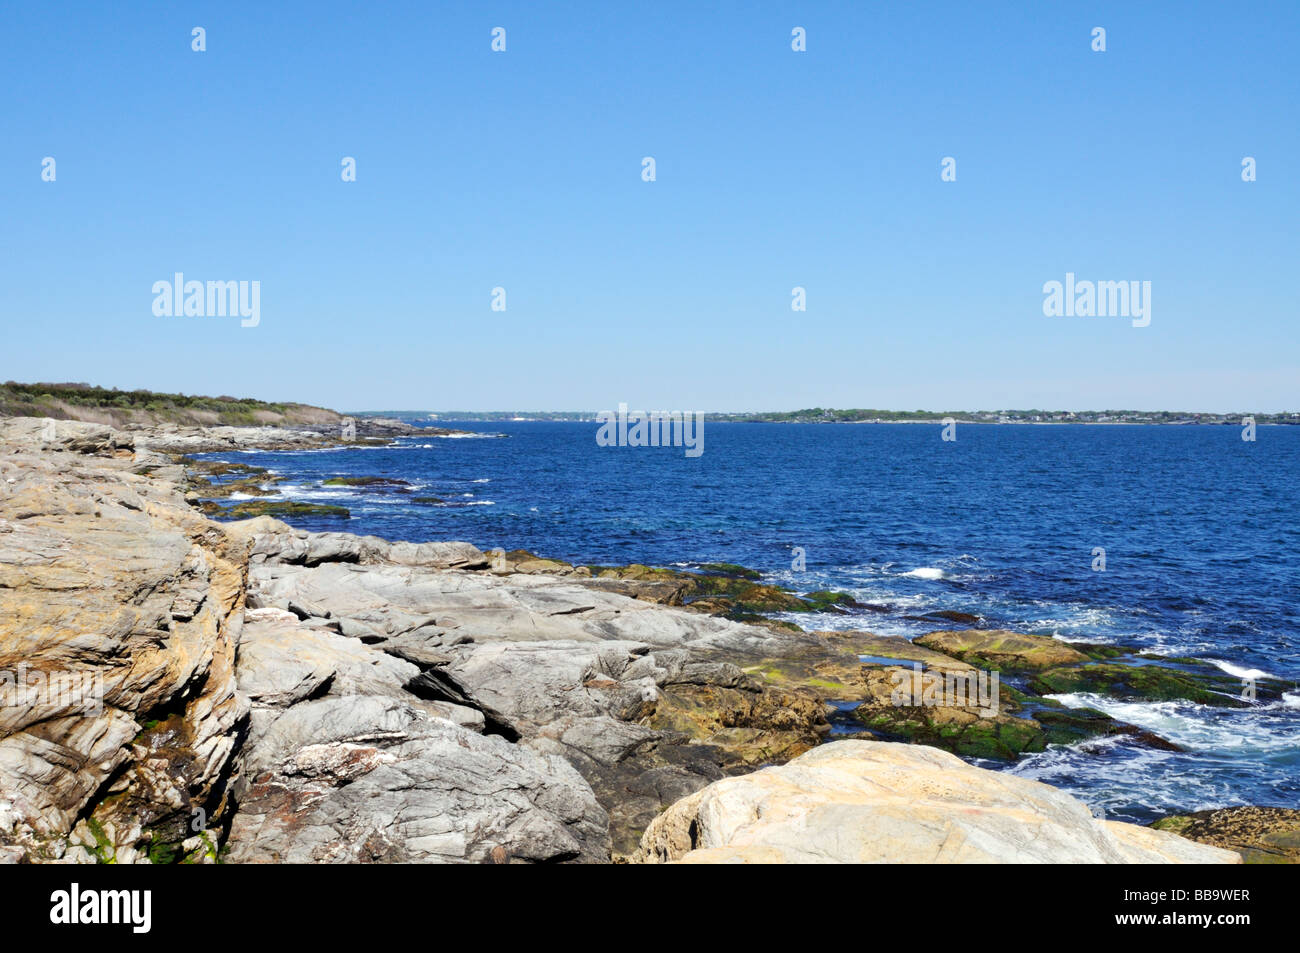 Scenic rocky coastline of Jamestown Rhode Island in Beavertail State Park Stock Photo